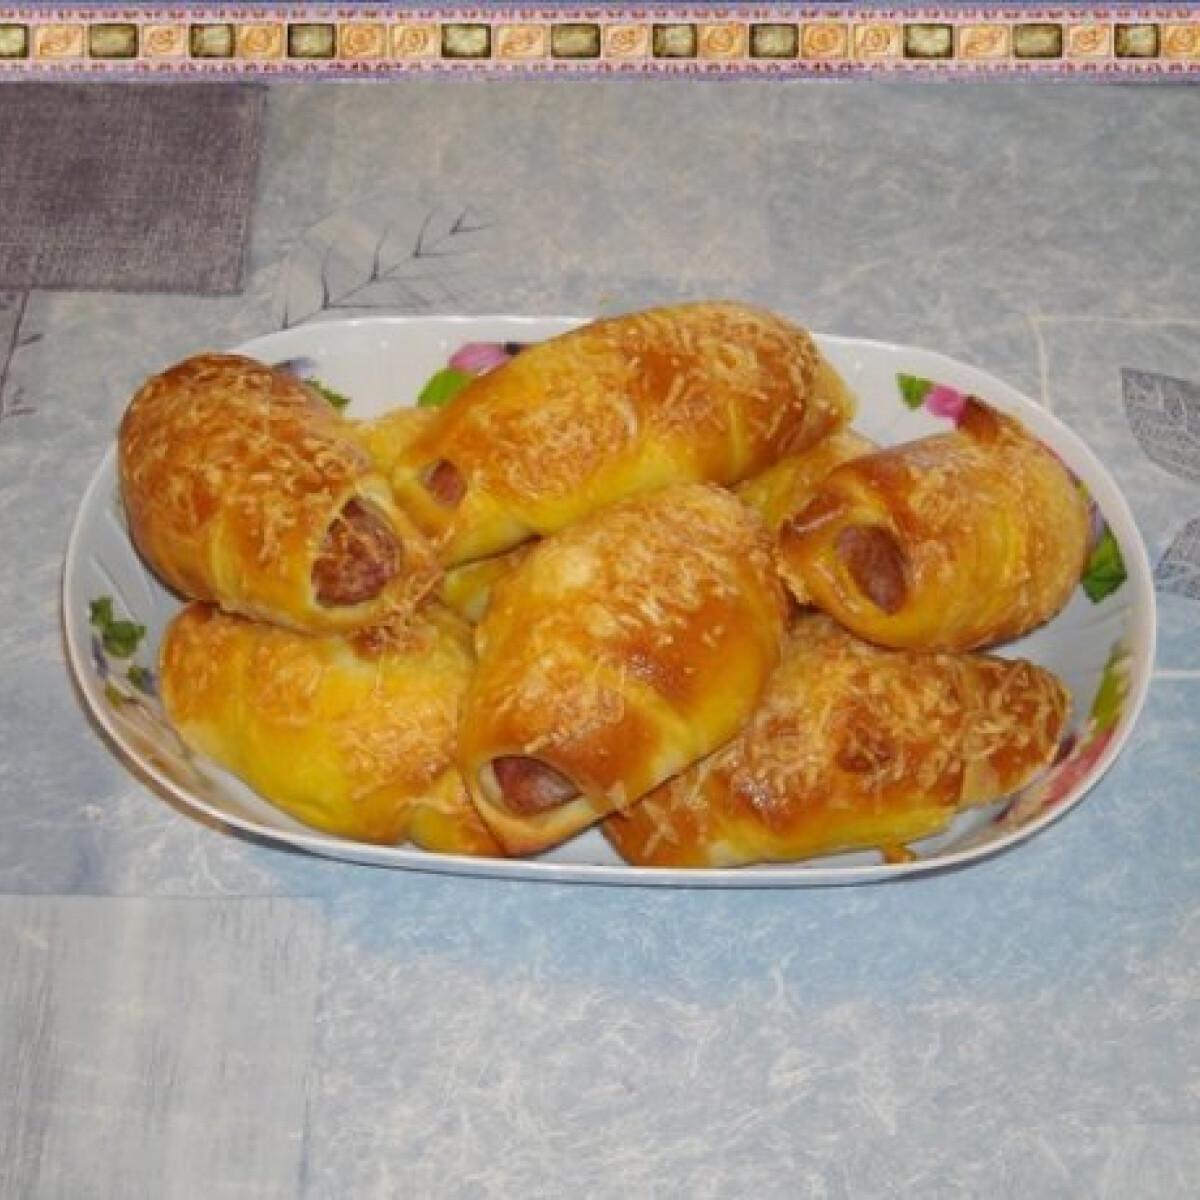 Virslis kifli Nikóka konyhájából